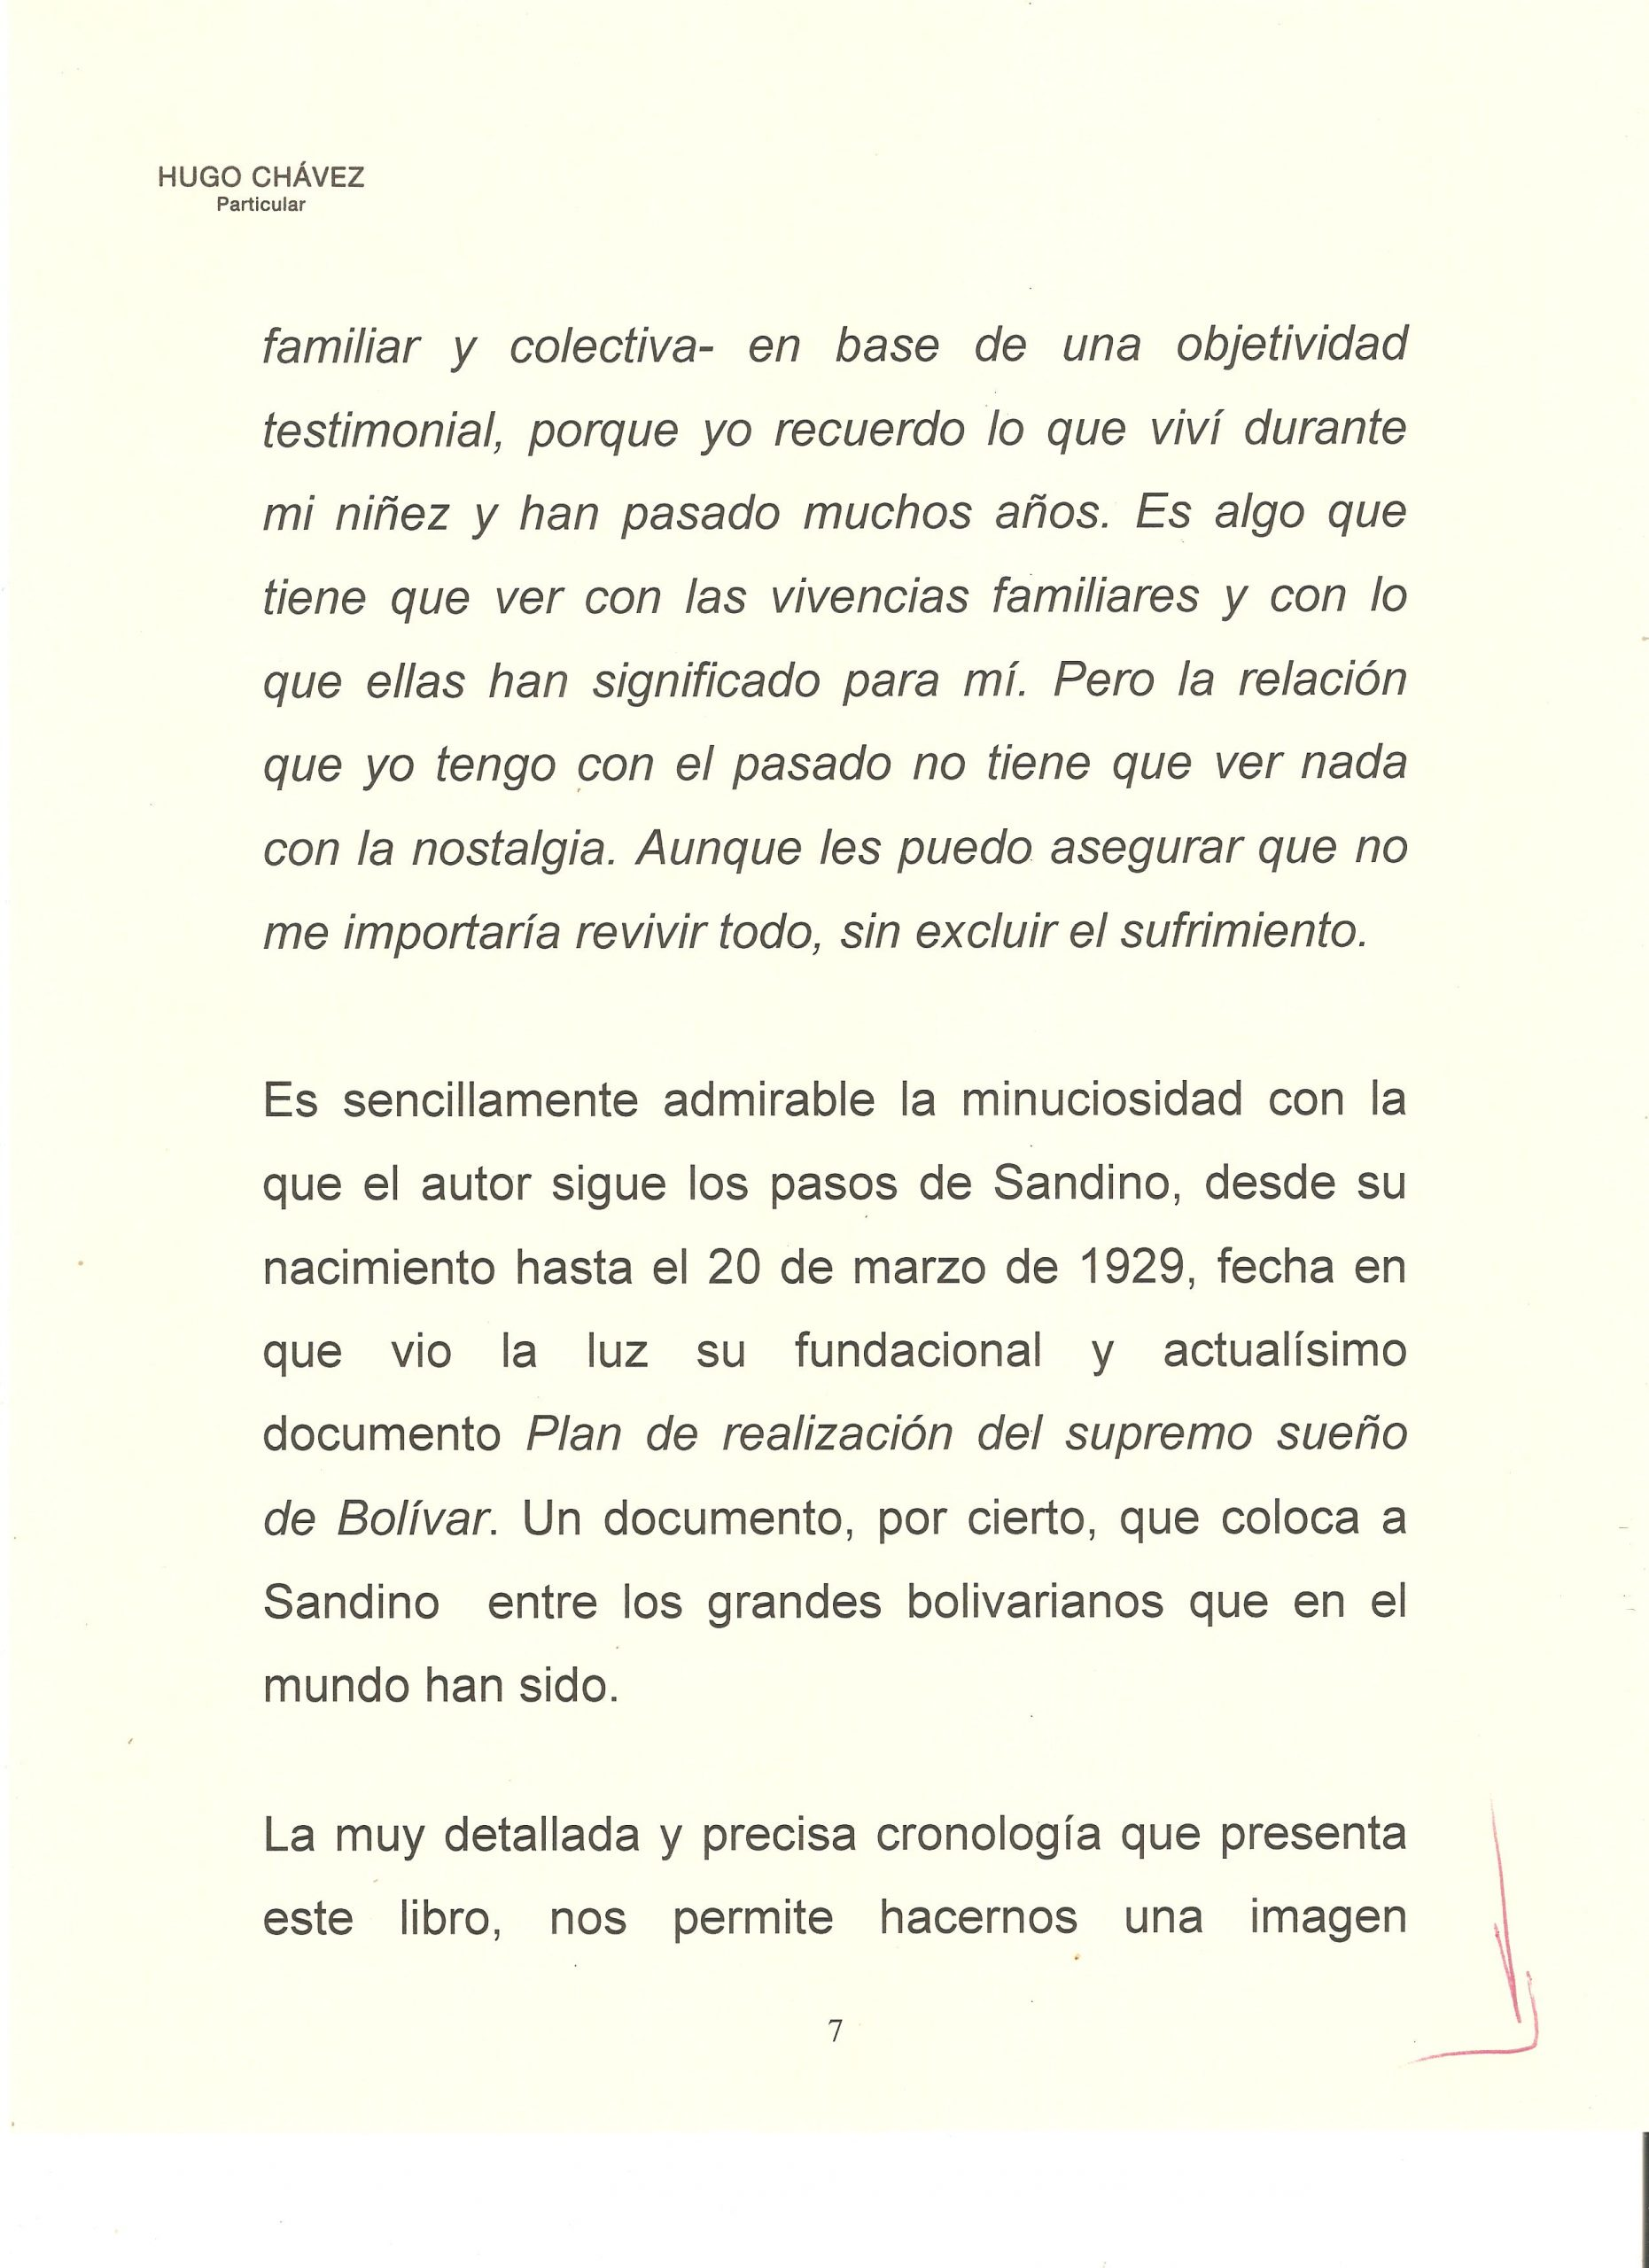 PROLOGO DE HUGO CHAVEZ A WALTER 7